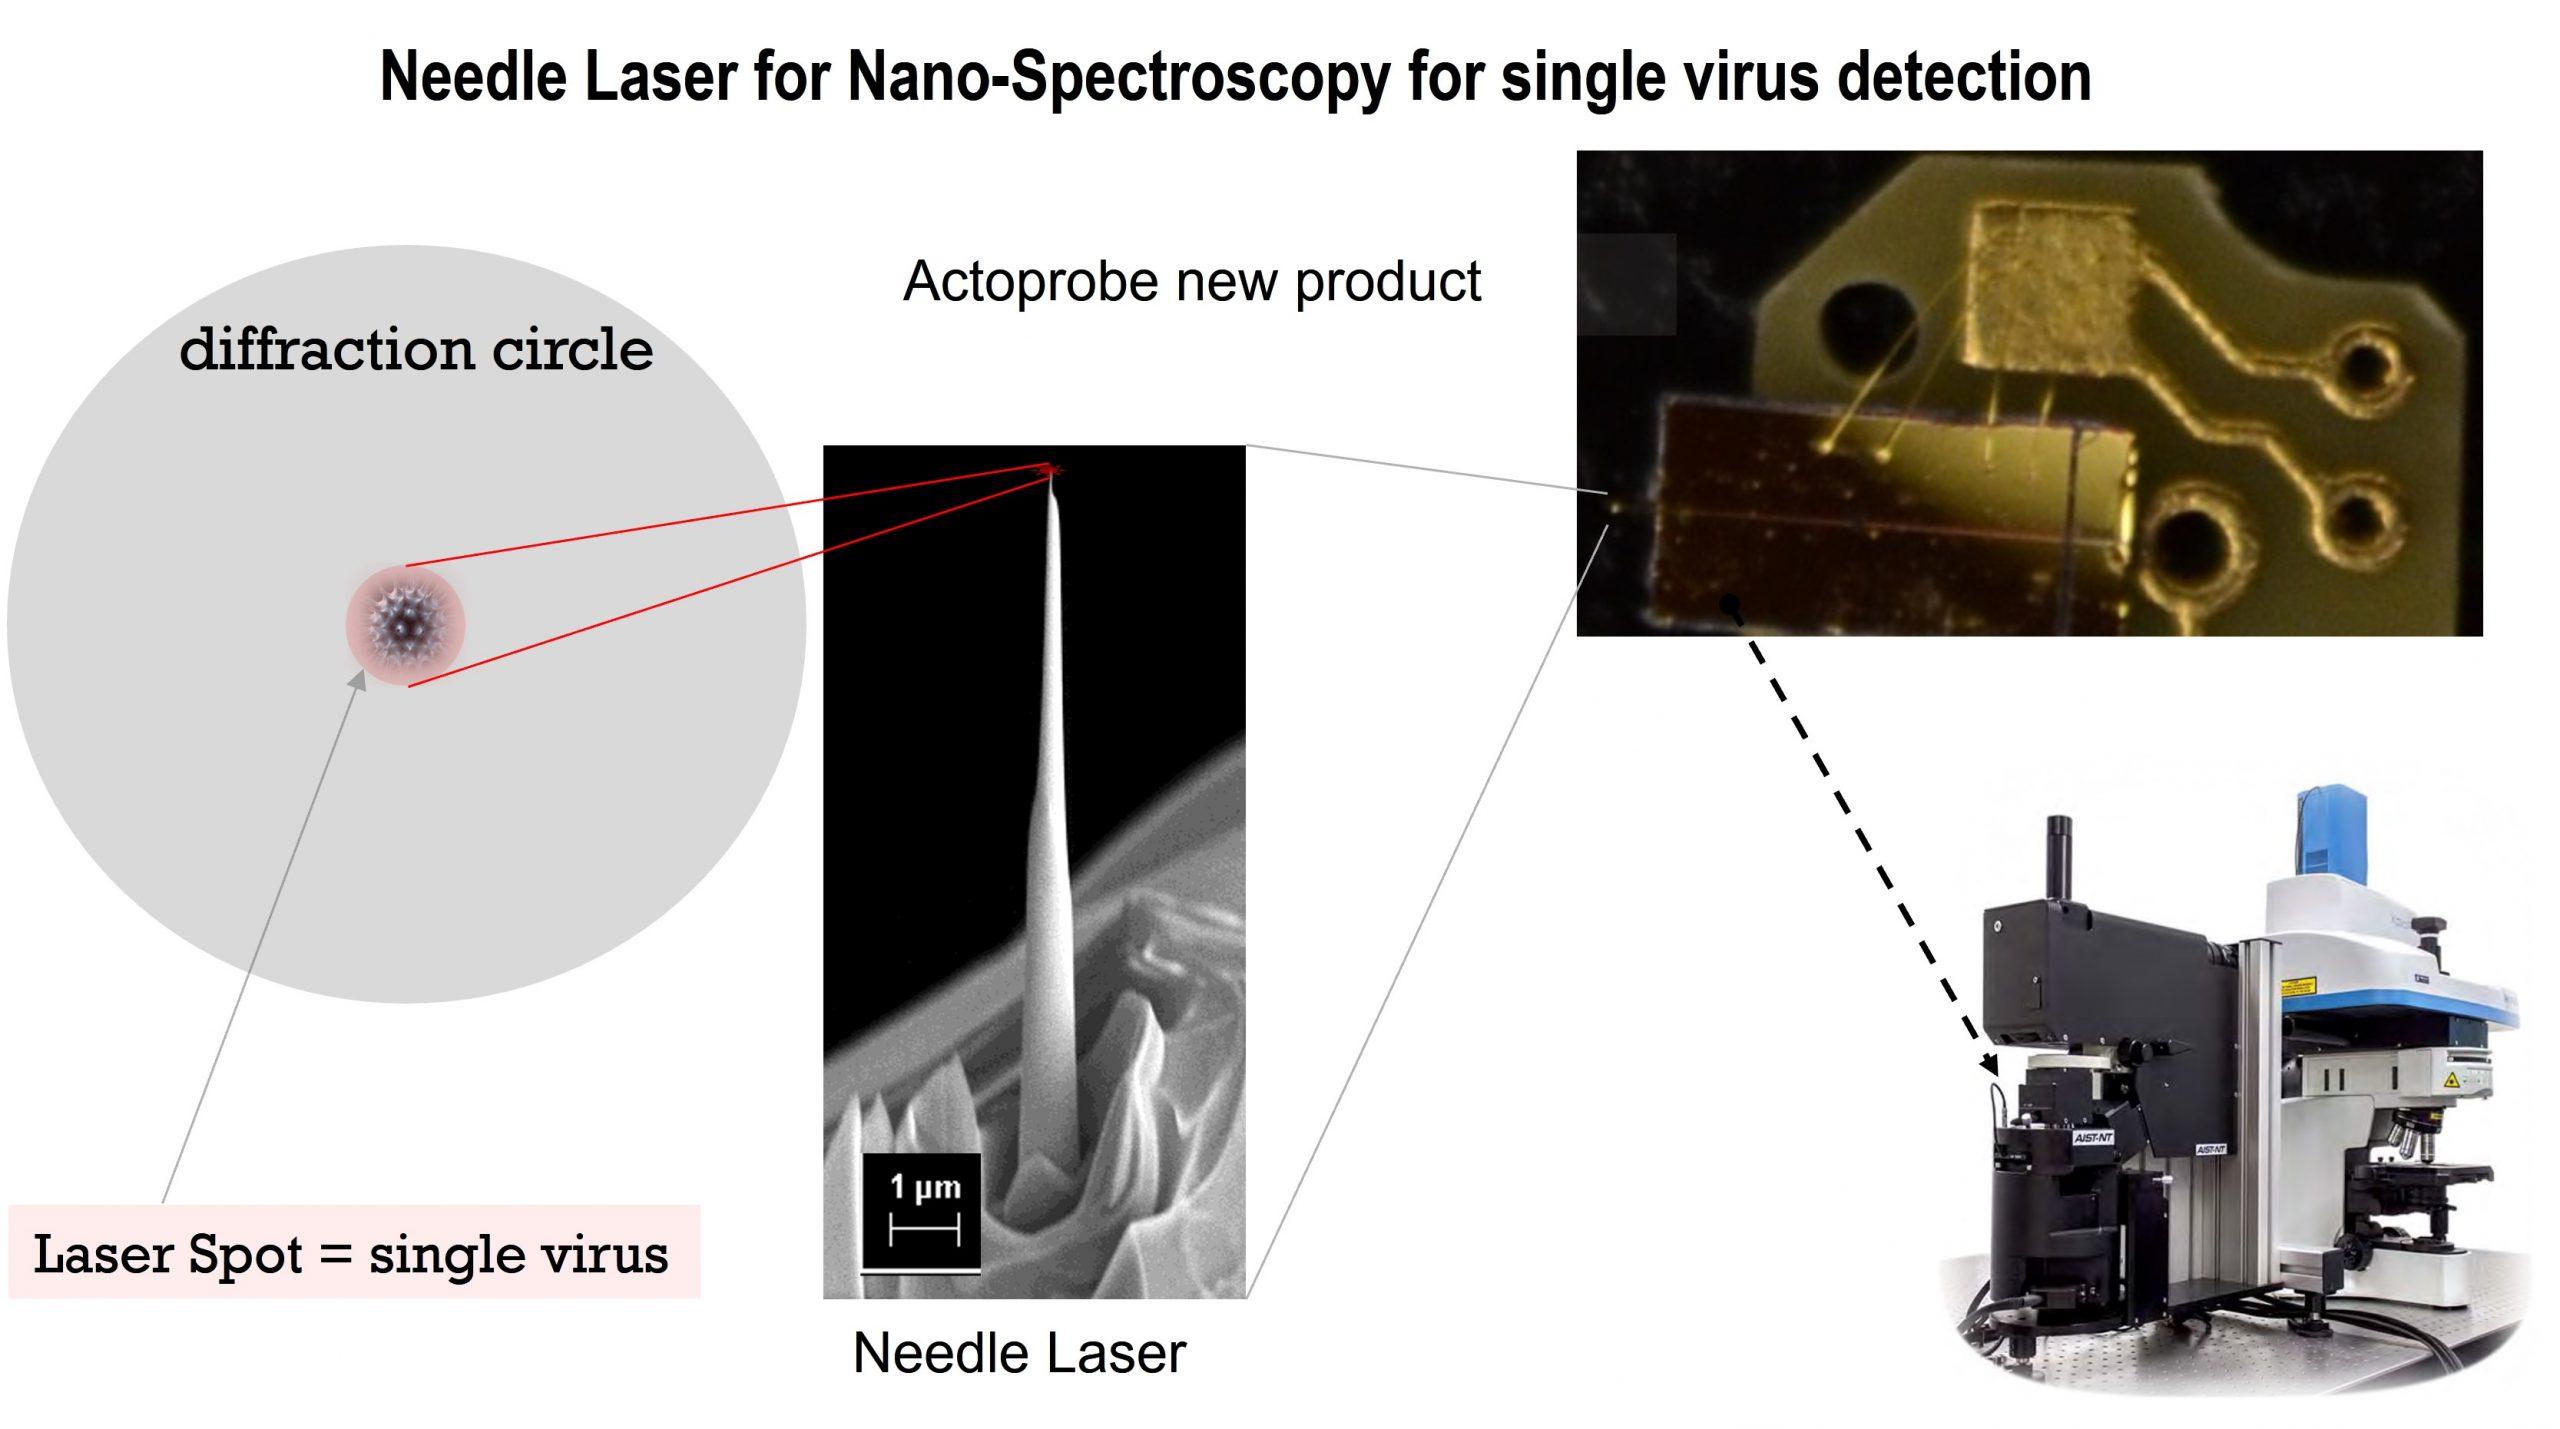 Needle_laser_nanospectroscopy